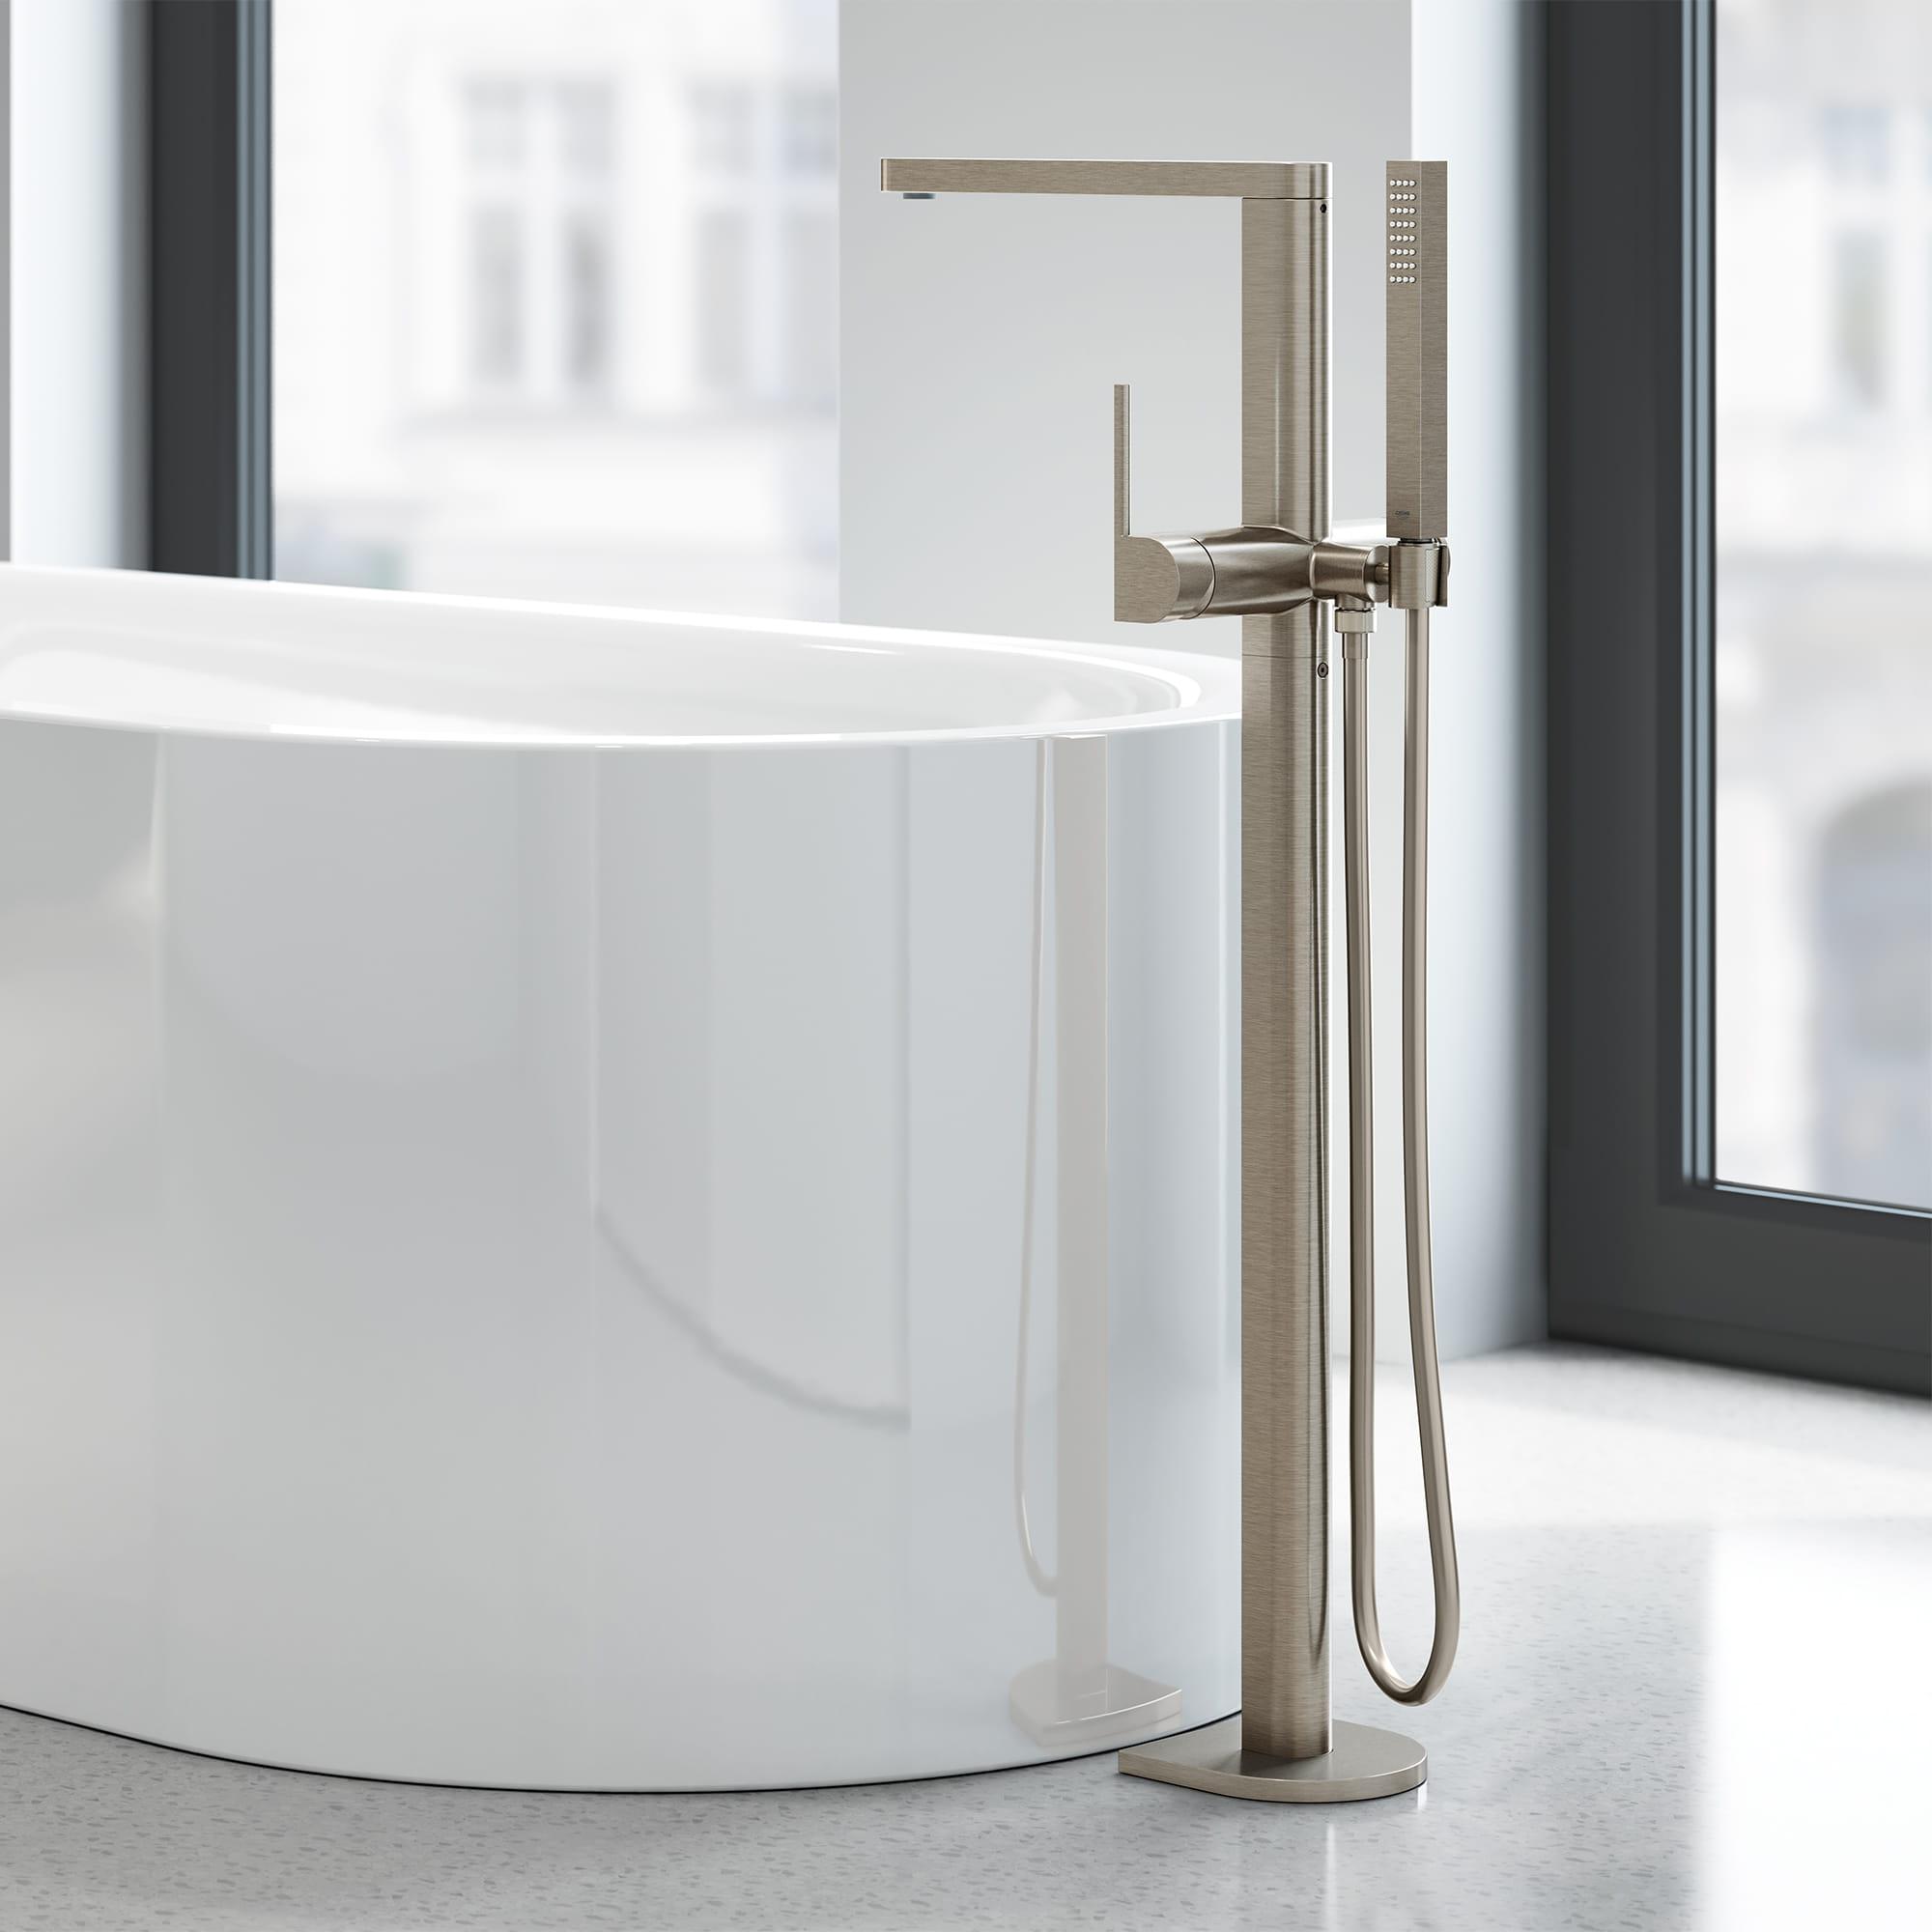 Eurocube robinet de baignoire